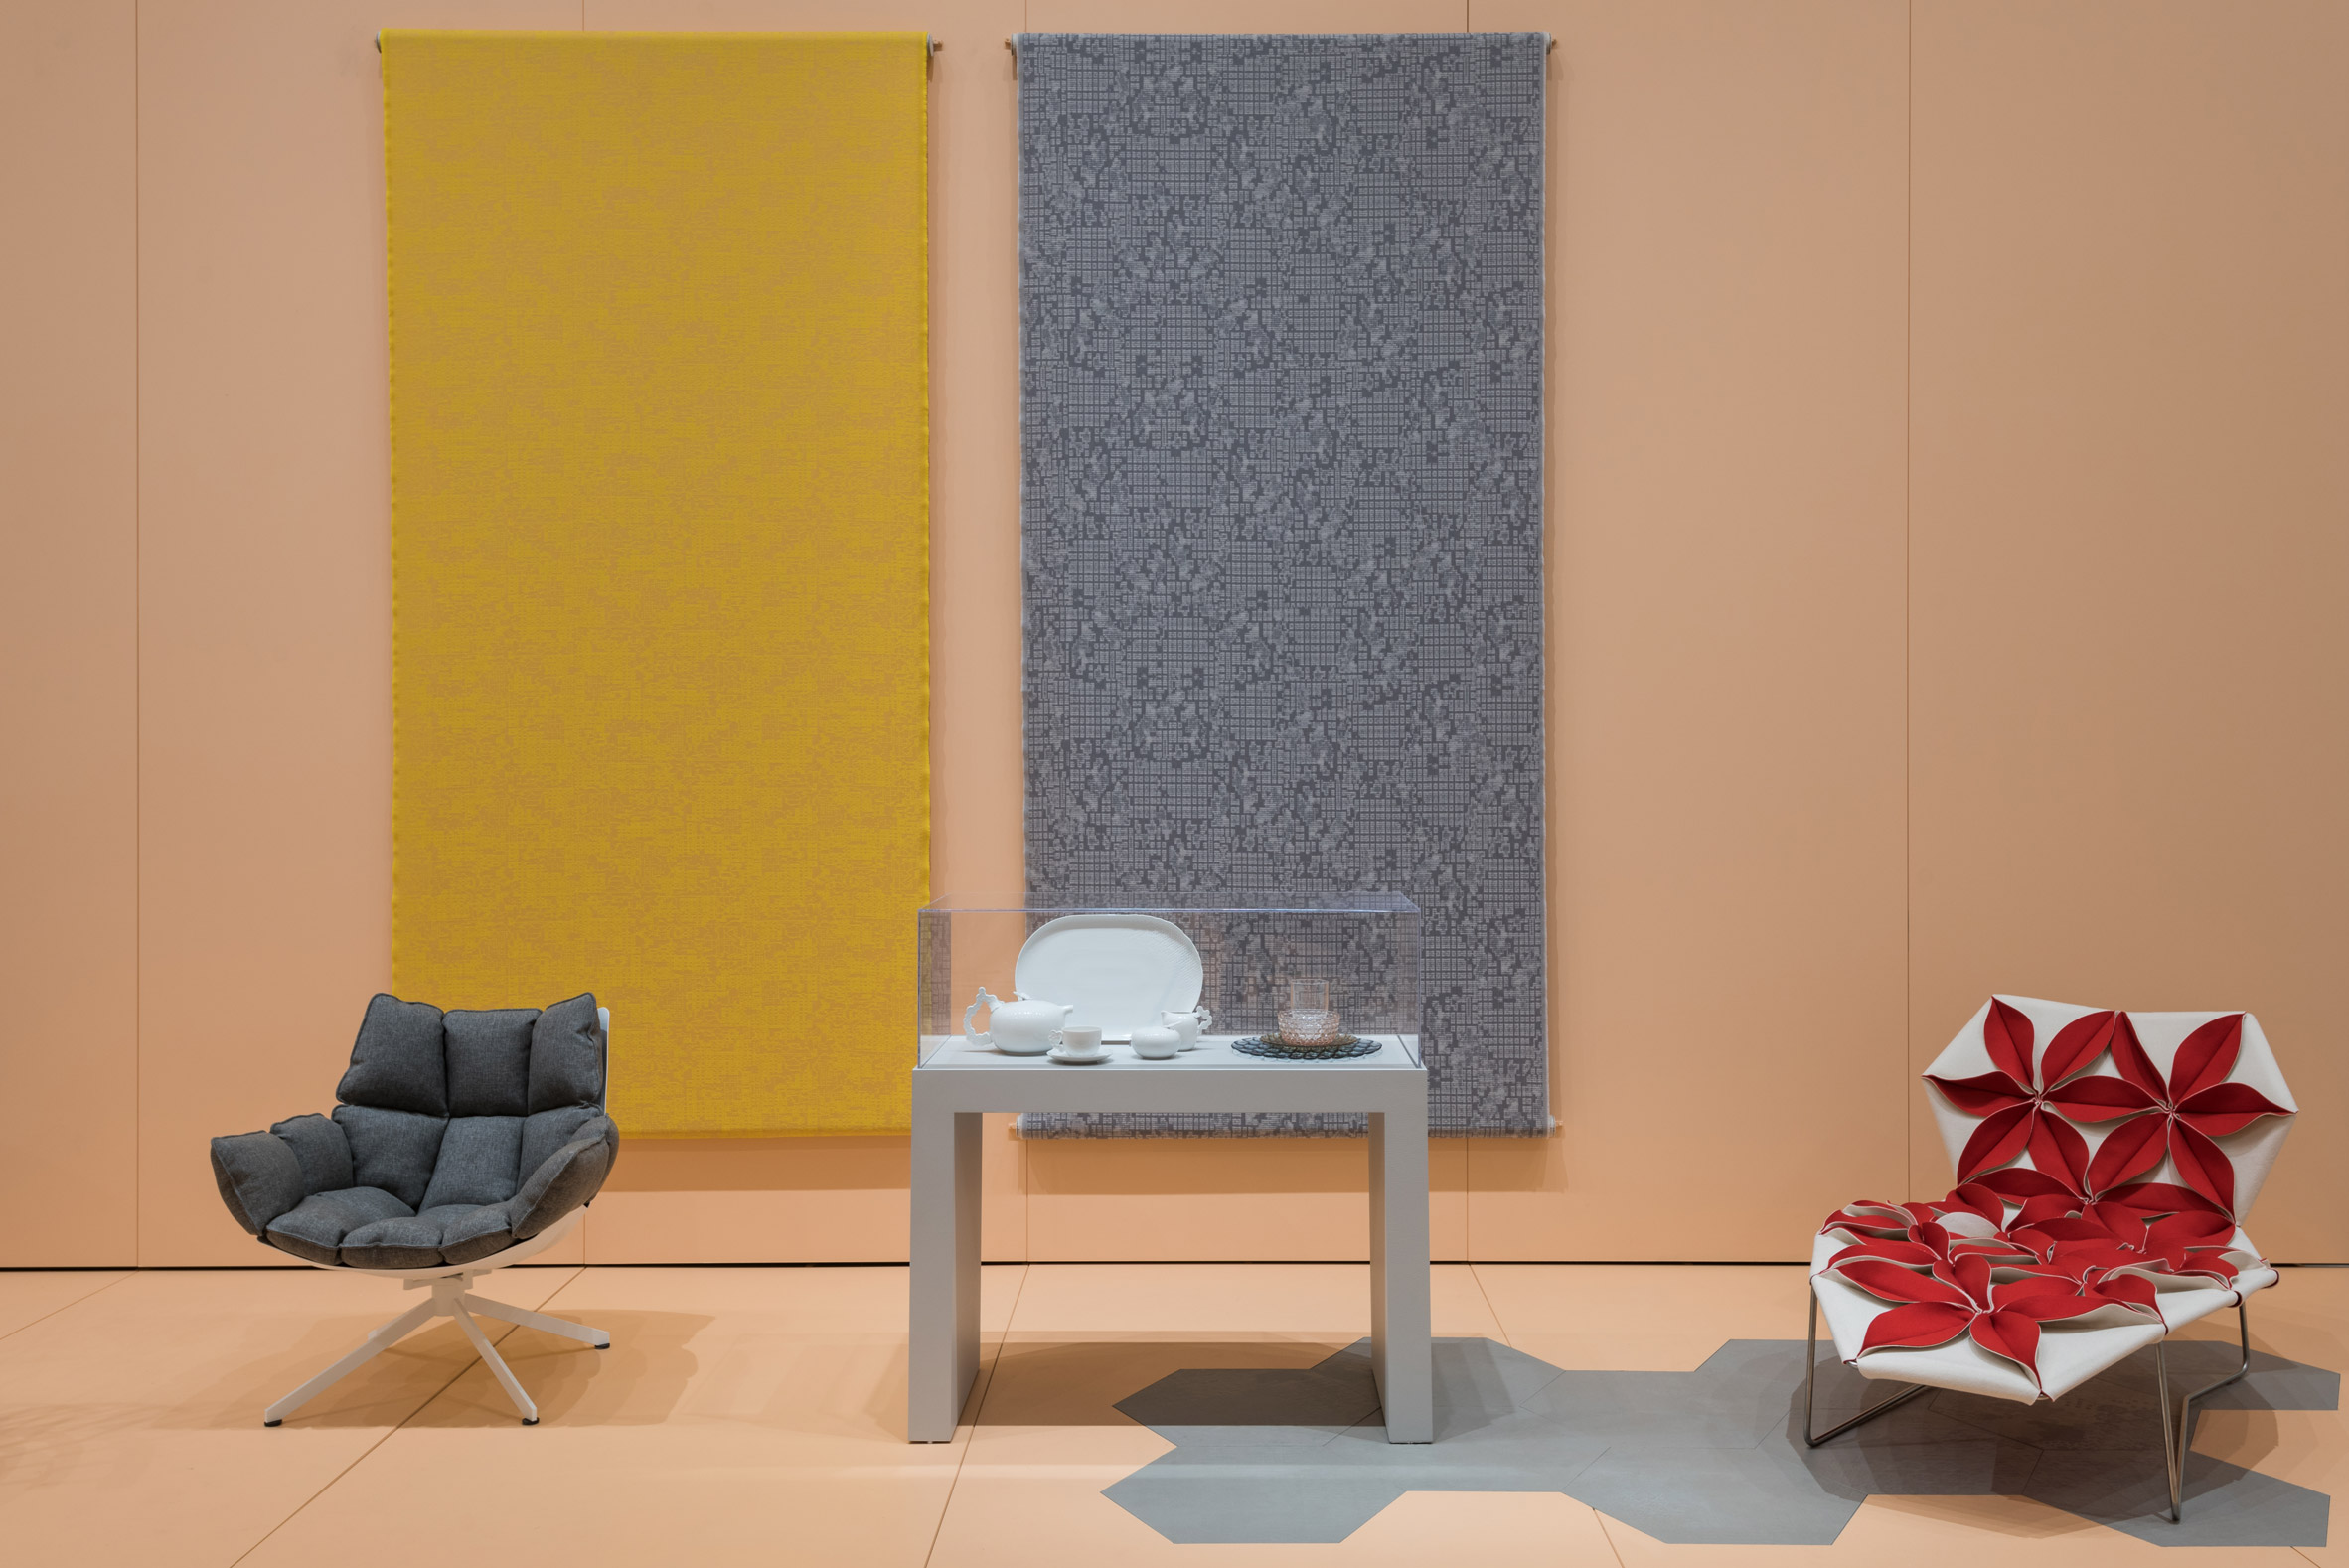 Philadelphia Museum of Art celebrates Patricia Urquiola with retrospective exhibition